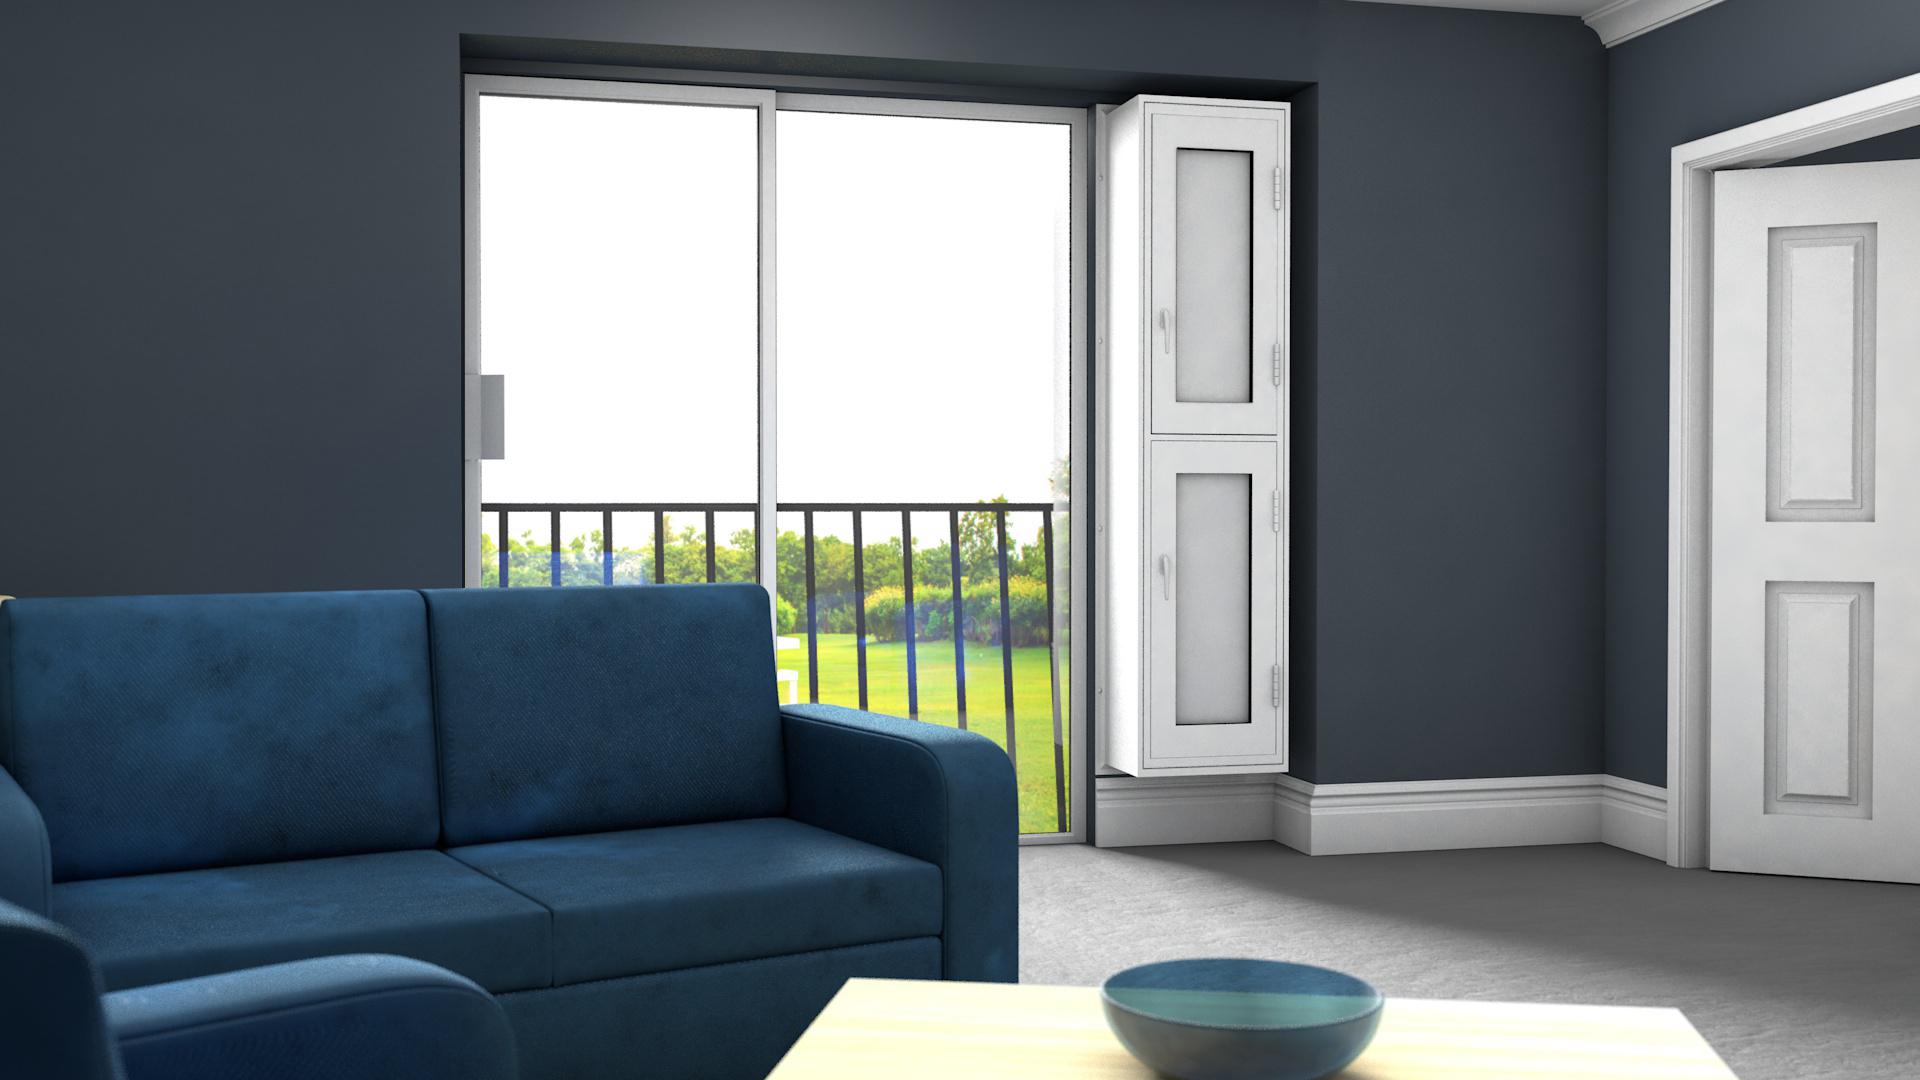 avo 03 - Residential Ventilation Unit - AVO3